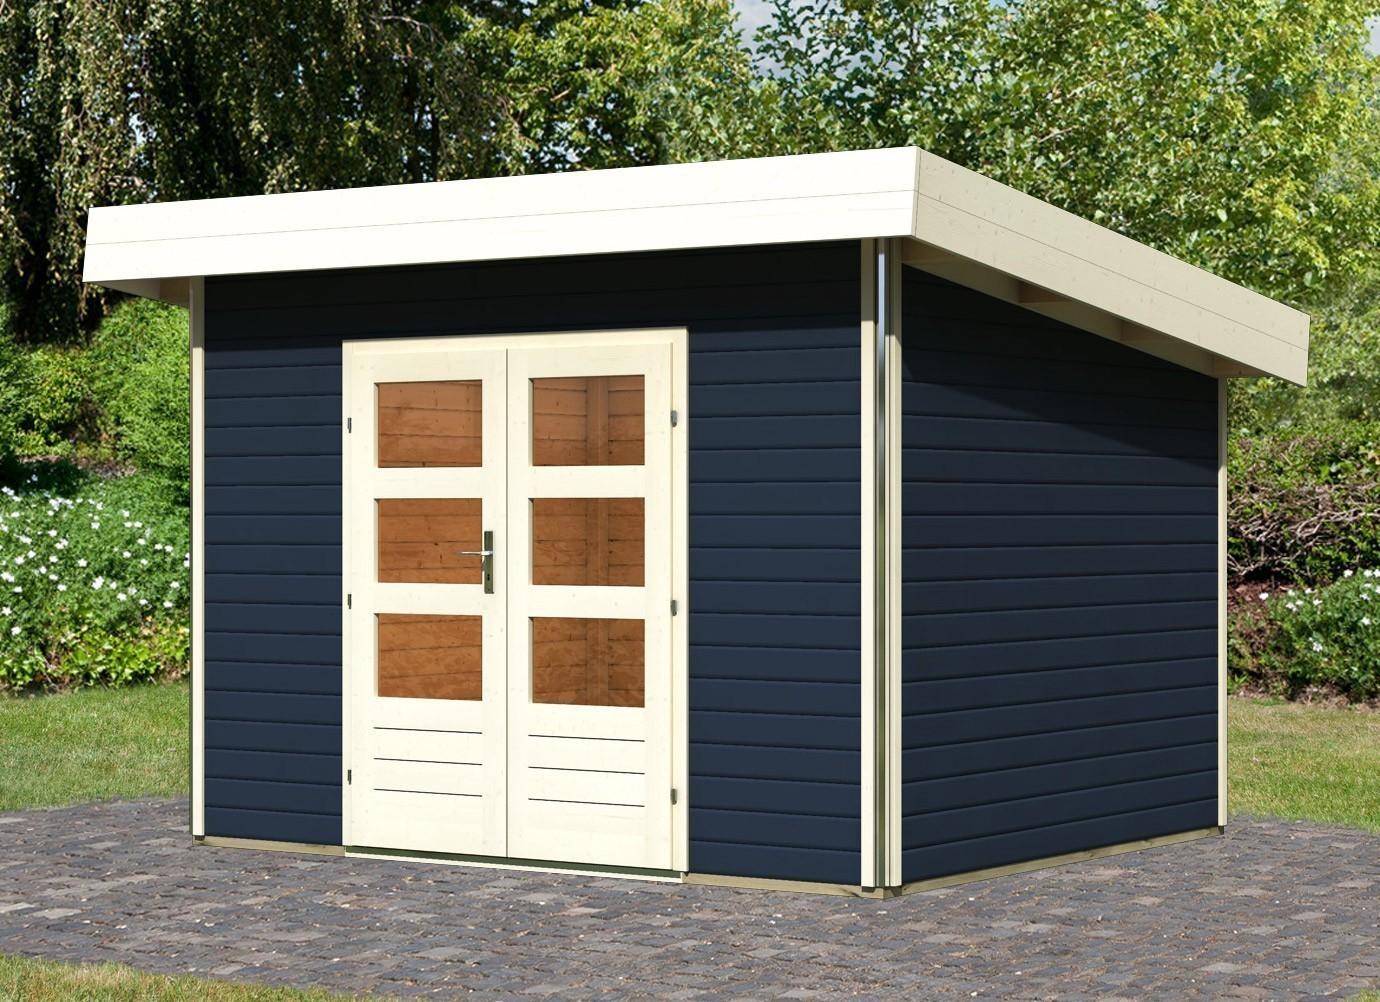 karibu gartenhaus 40mm moosburg 2 grau 358x299cm bei. Black Bedroom Furniture Sets. Home Design Ideas